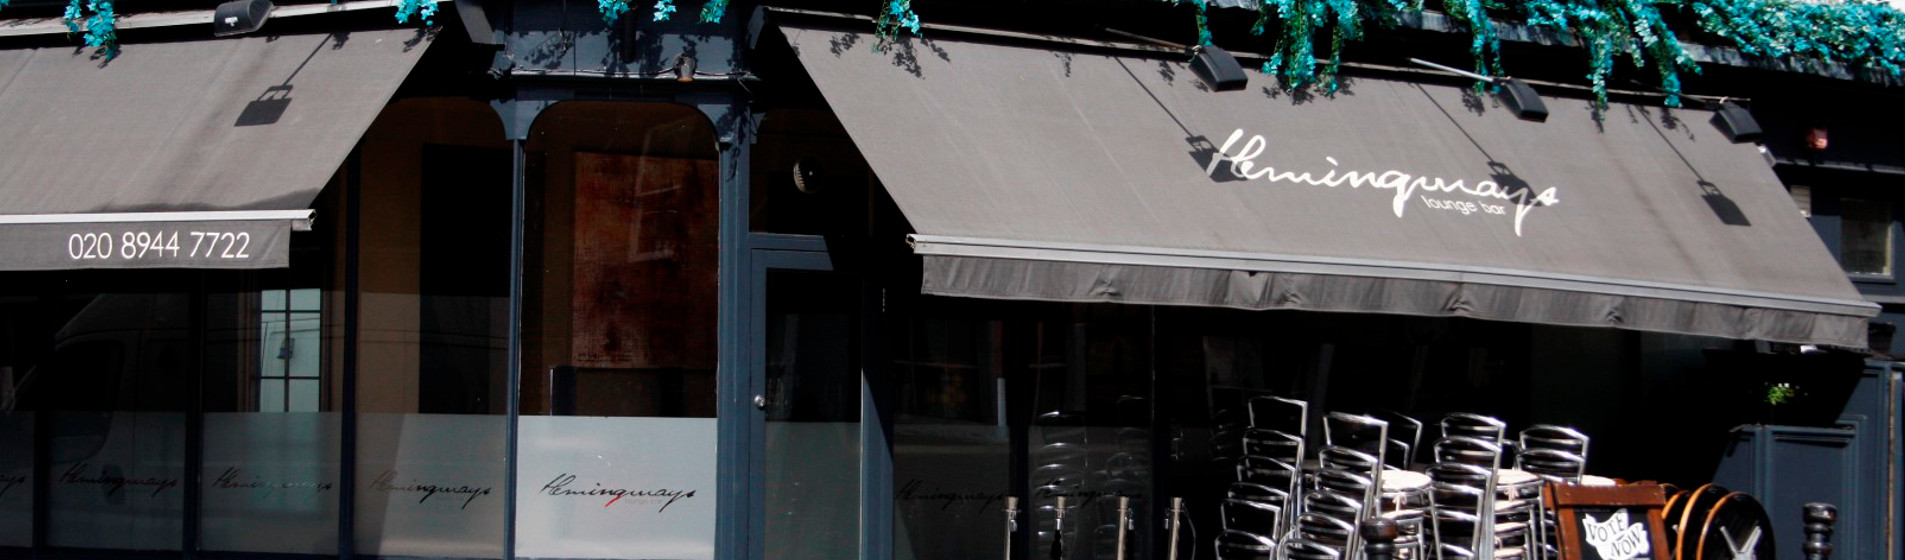 Hemingways – Wimbledon Village